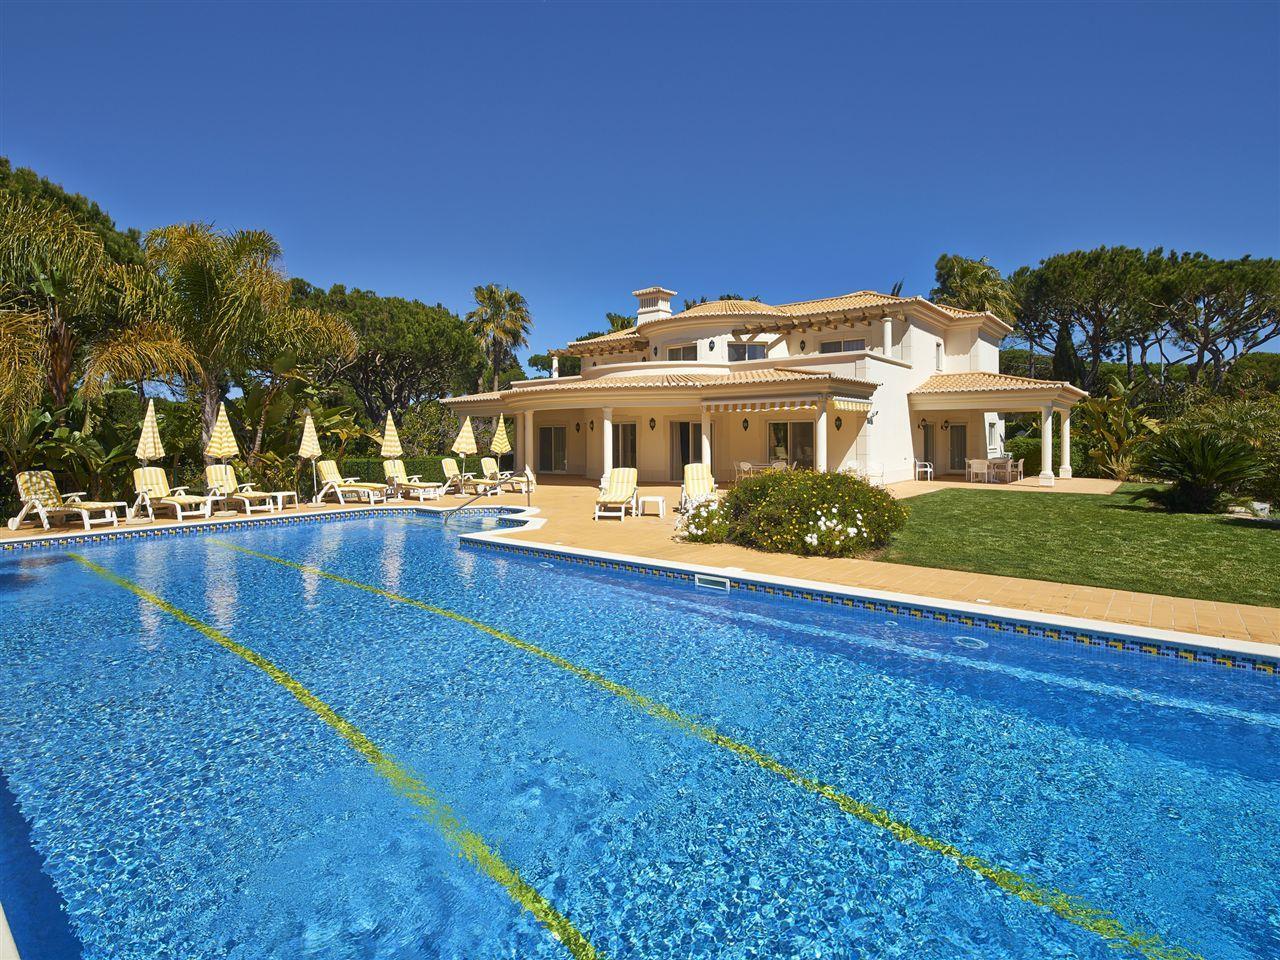 Moradia para Venda às Detached house, 5 bedrooms, for Sale Loule, Algarve Portugal